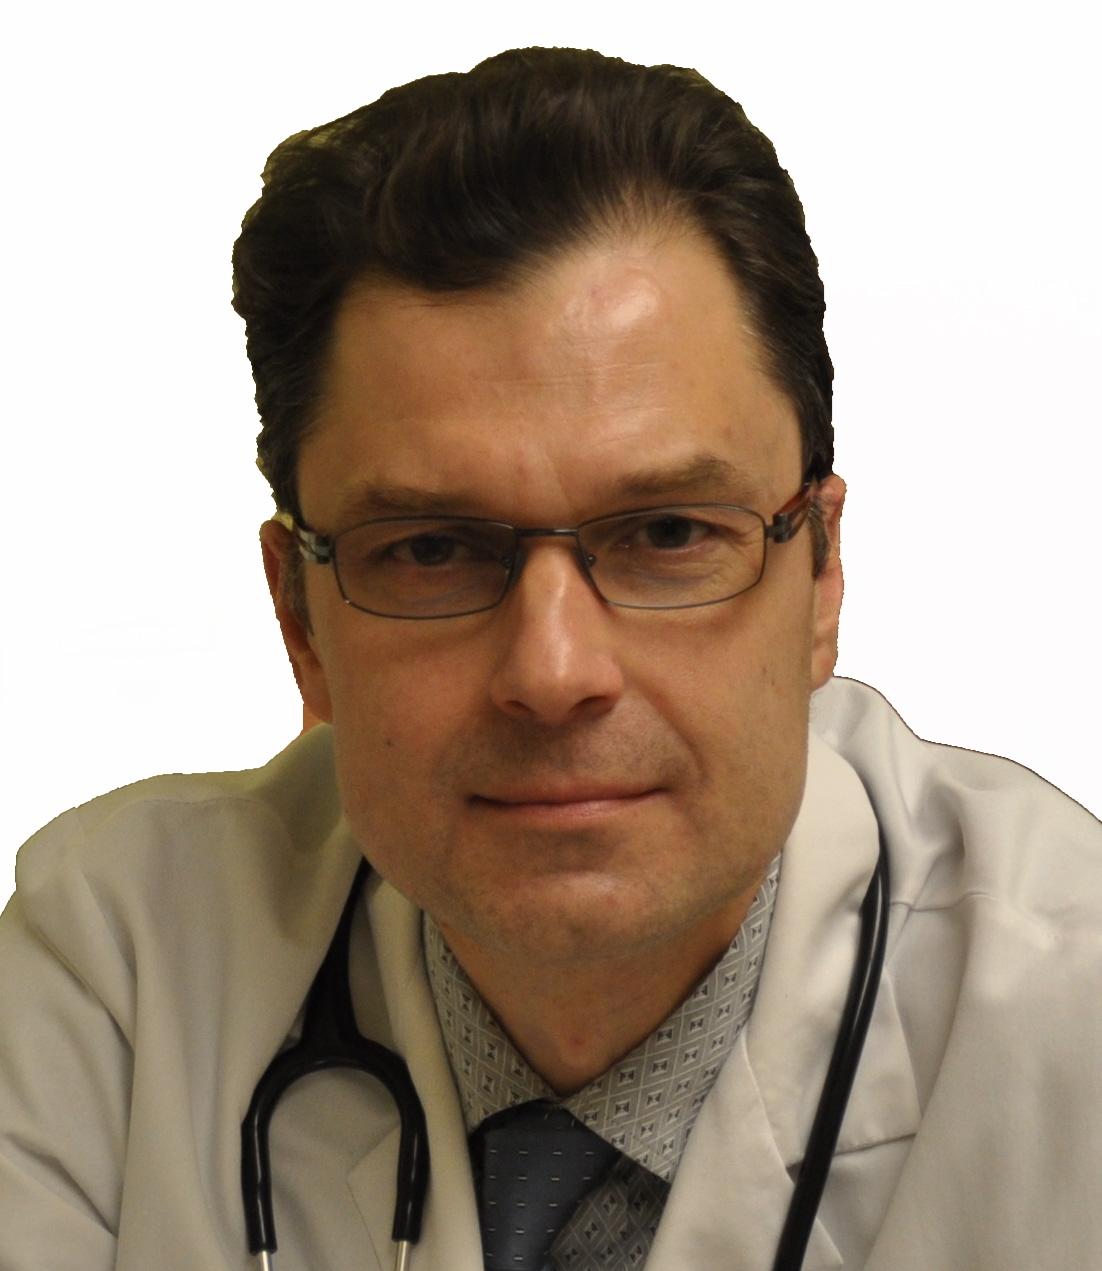 NYU Langone Neurologist - Brooklyn - Queens - New York - NY